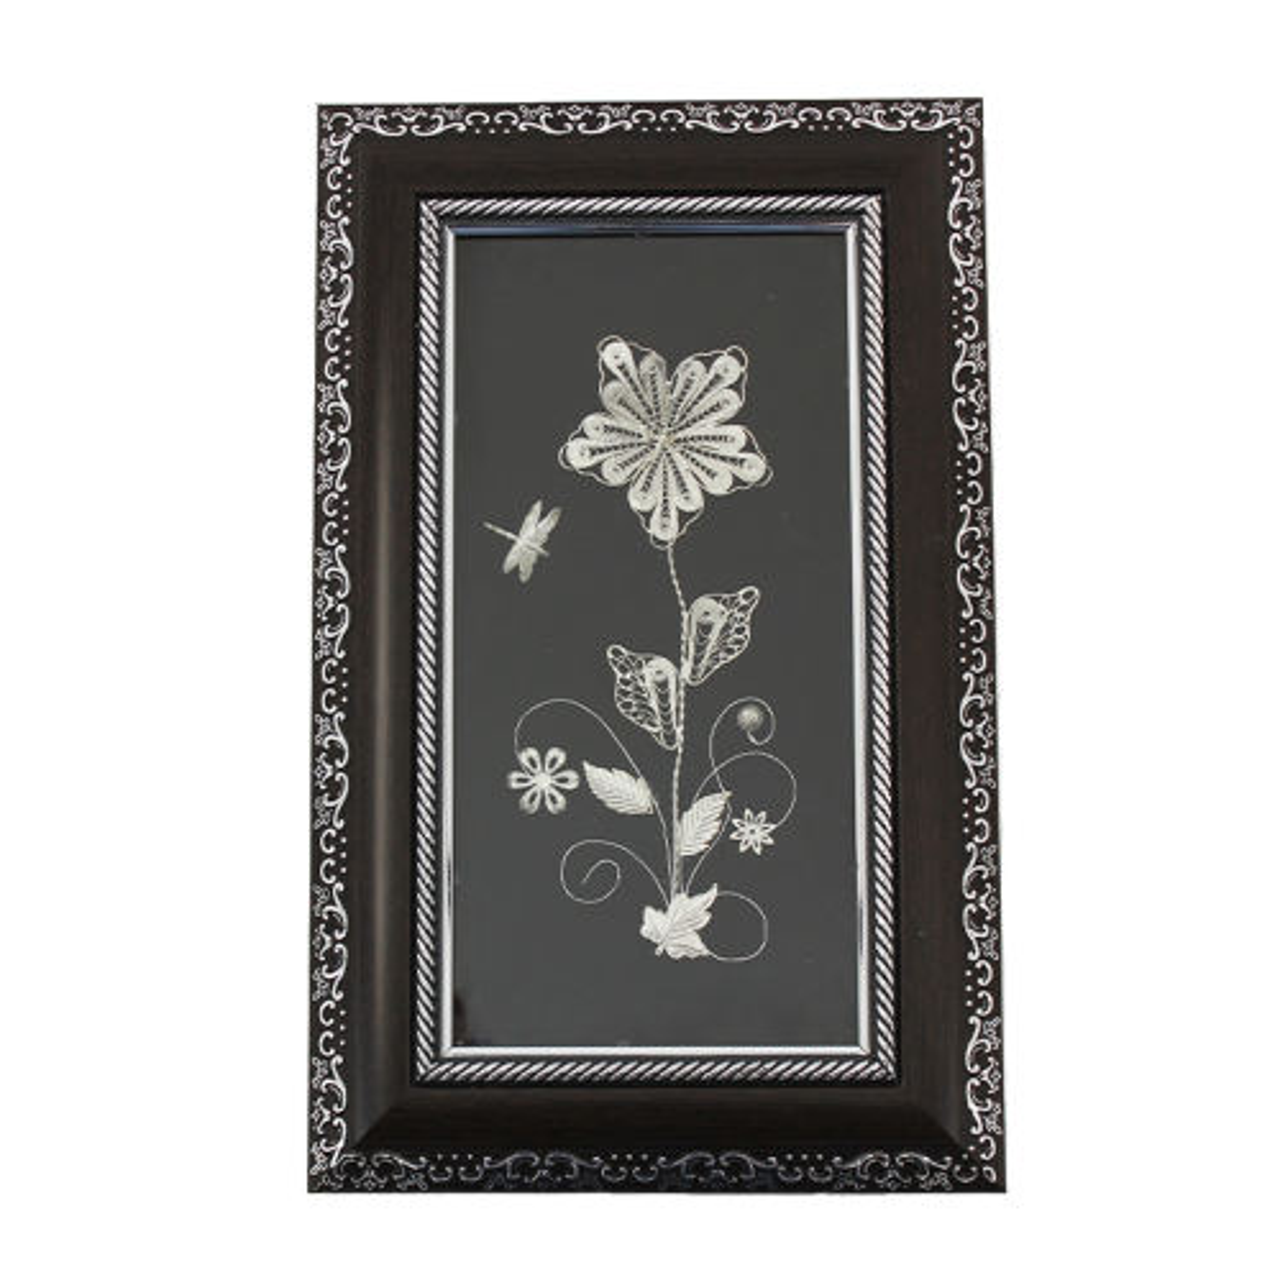 تابلو چوبی طرح گل و سنجاقک ملیله